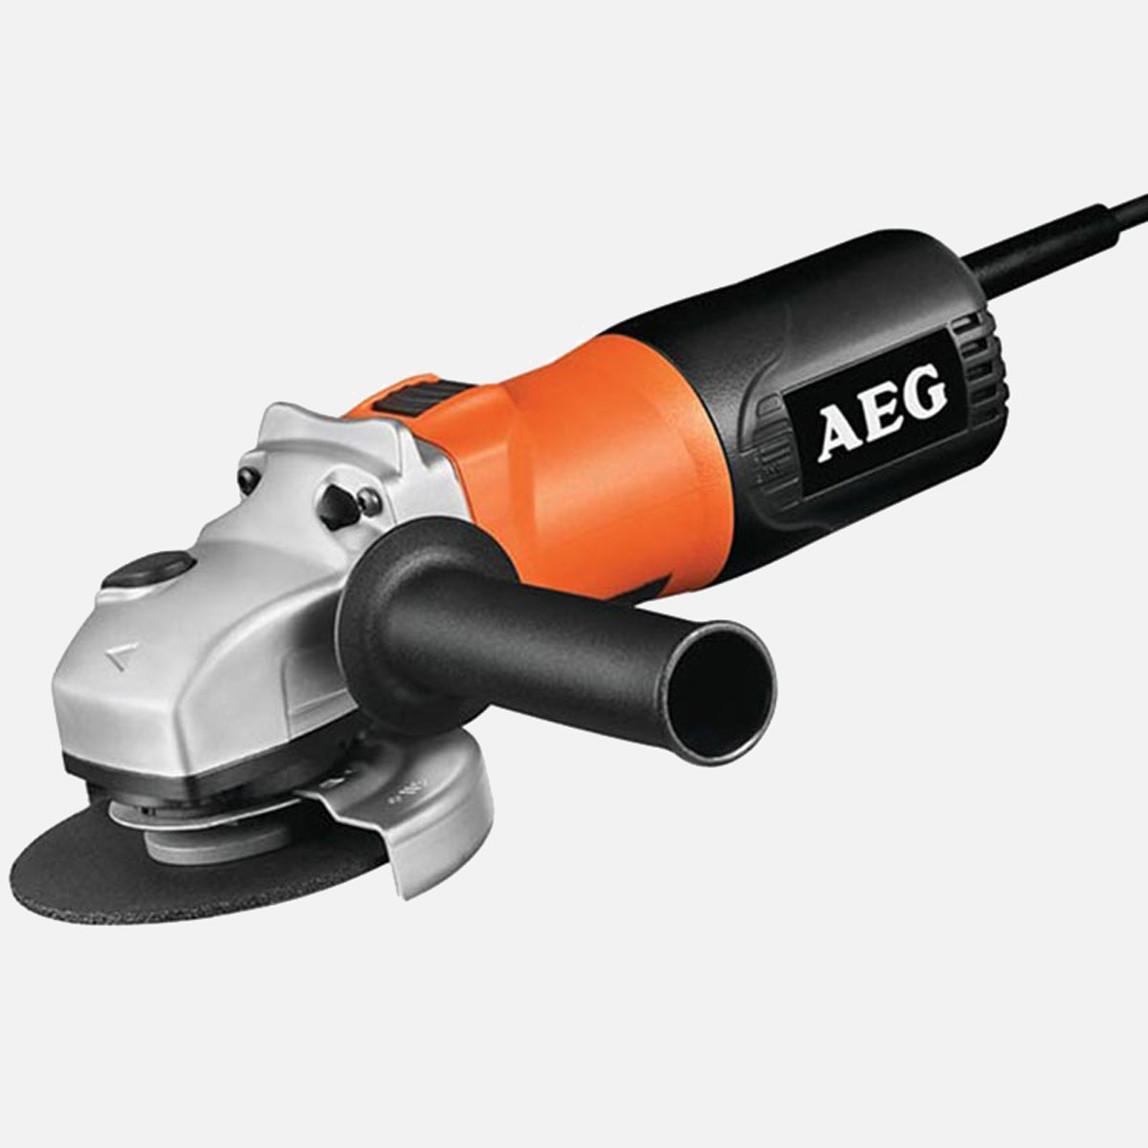 Aeg WS8-115S Avuç Taşlama